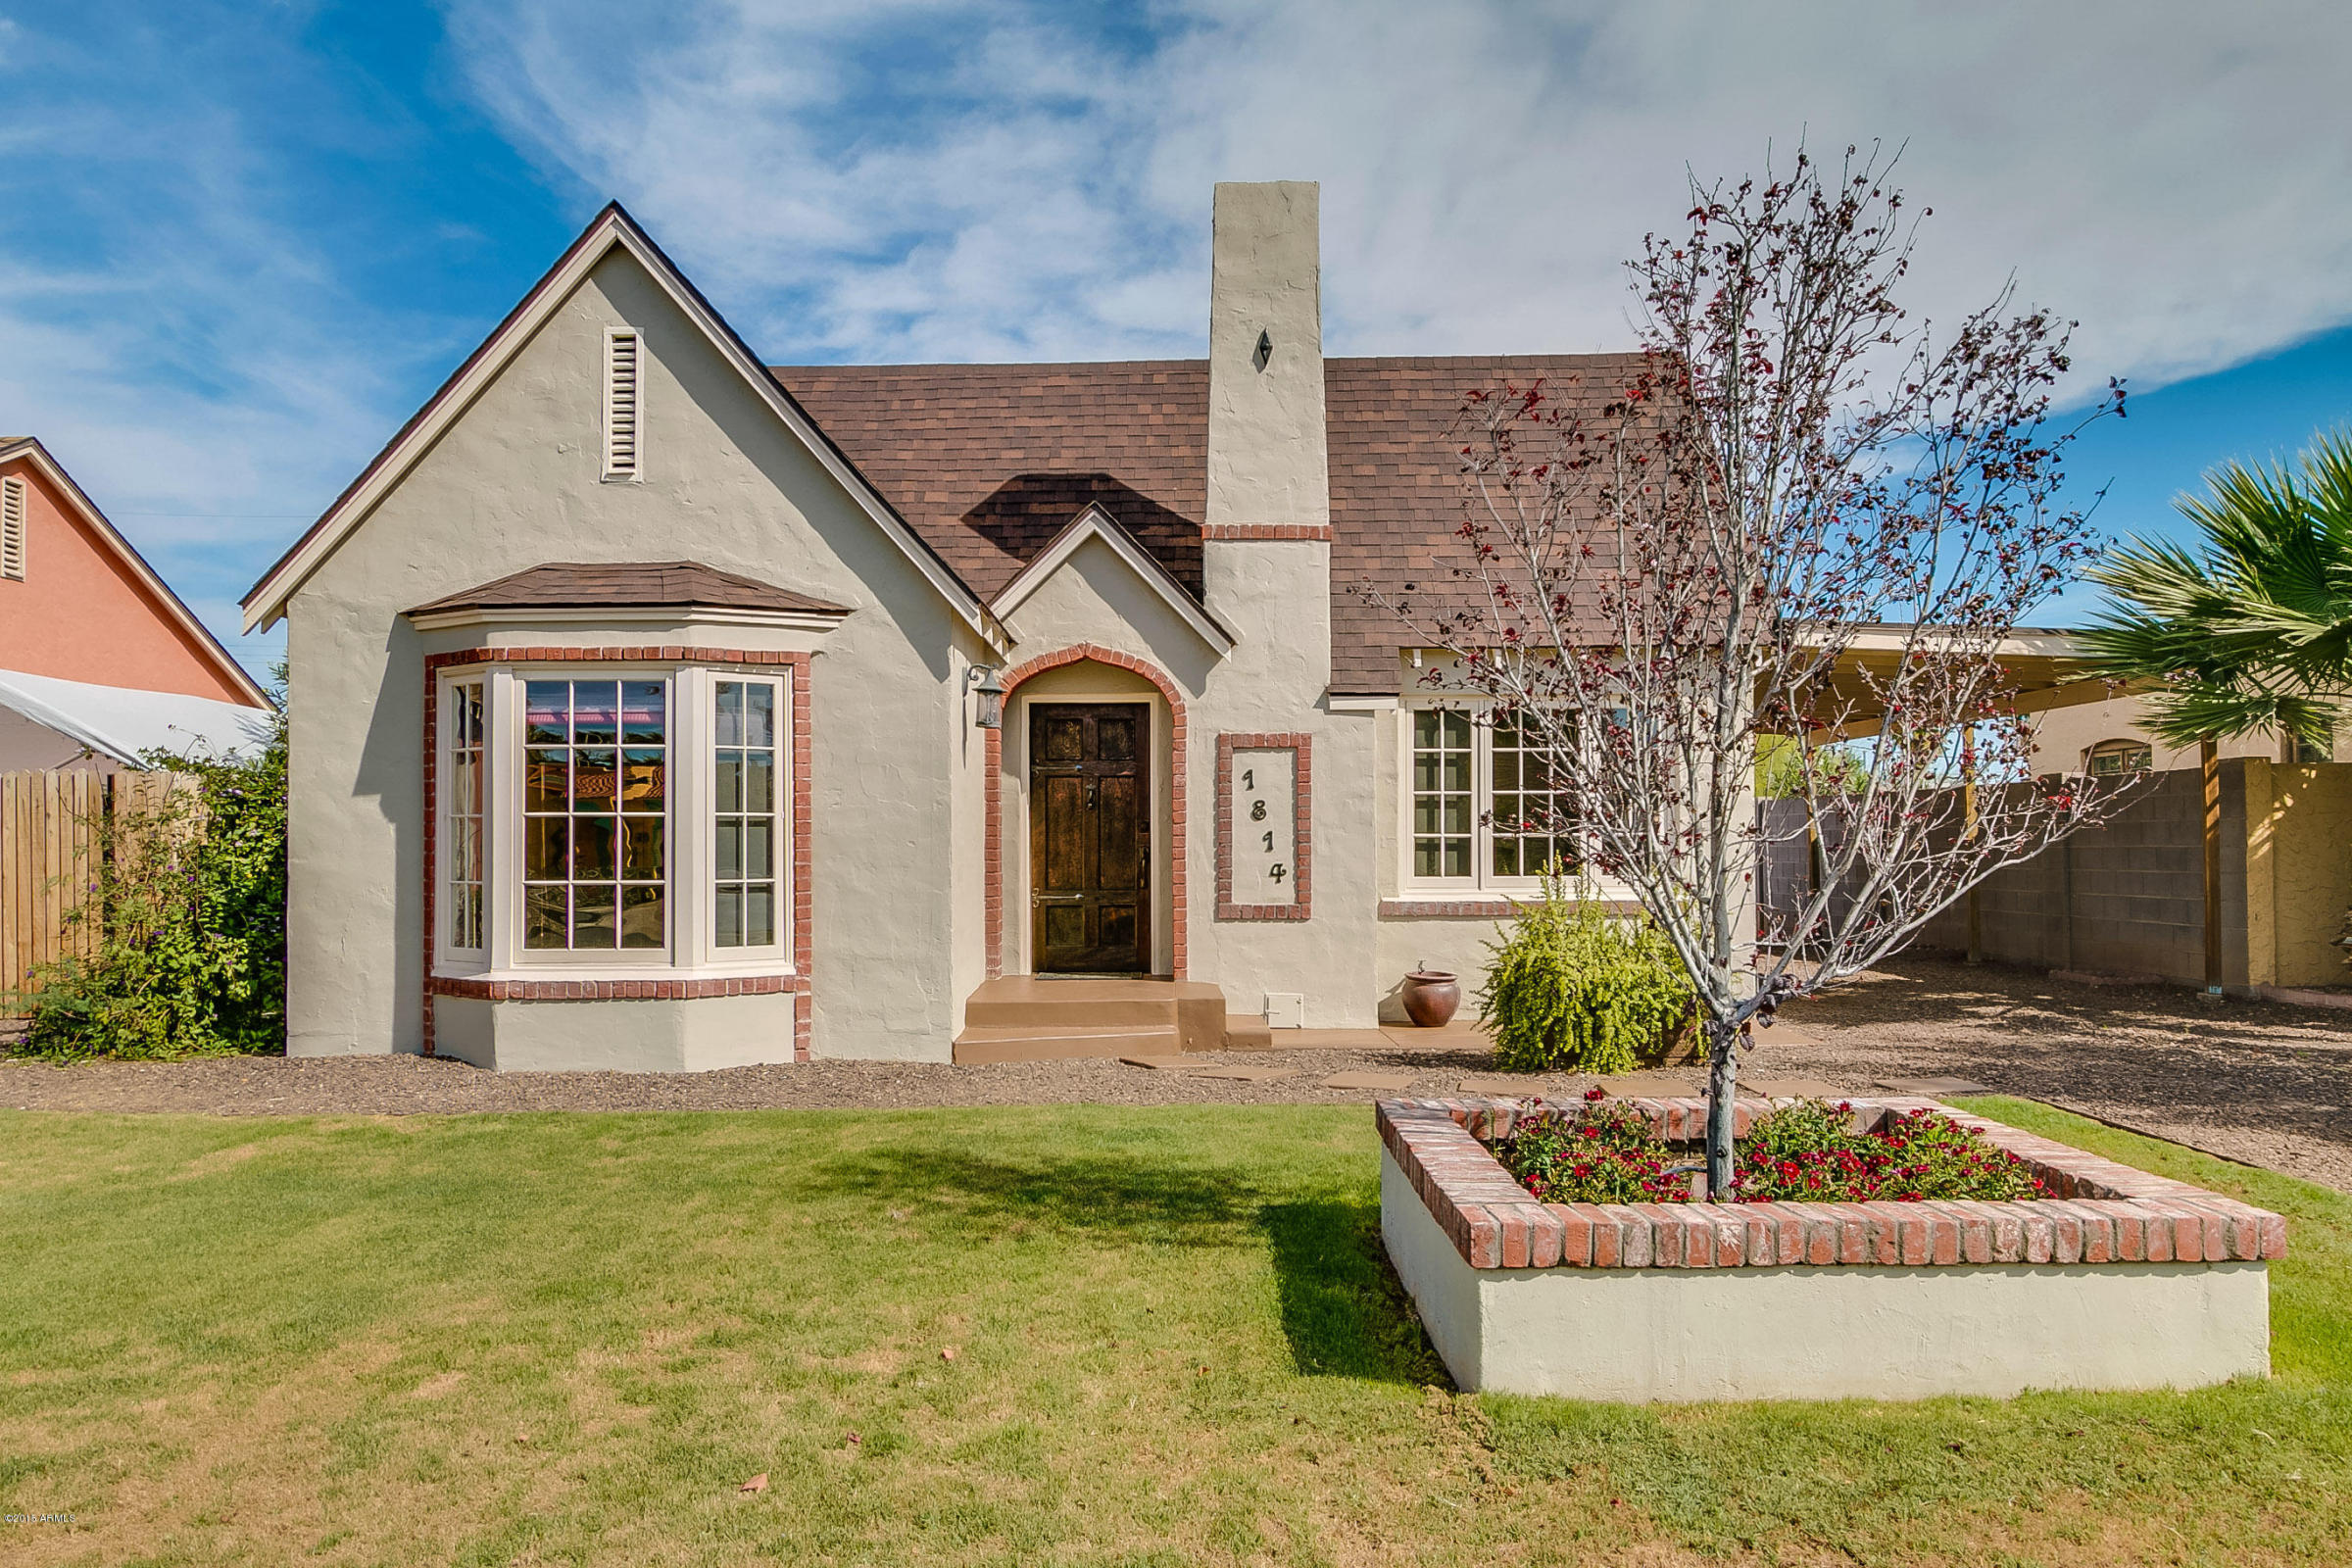 Historic Central Phoenix Homes for Sale Phoenix Homes For Sale